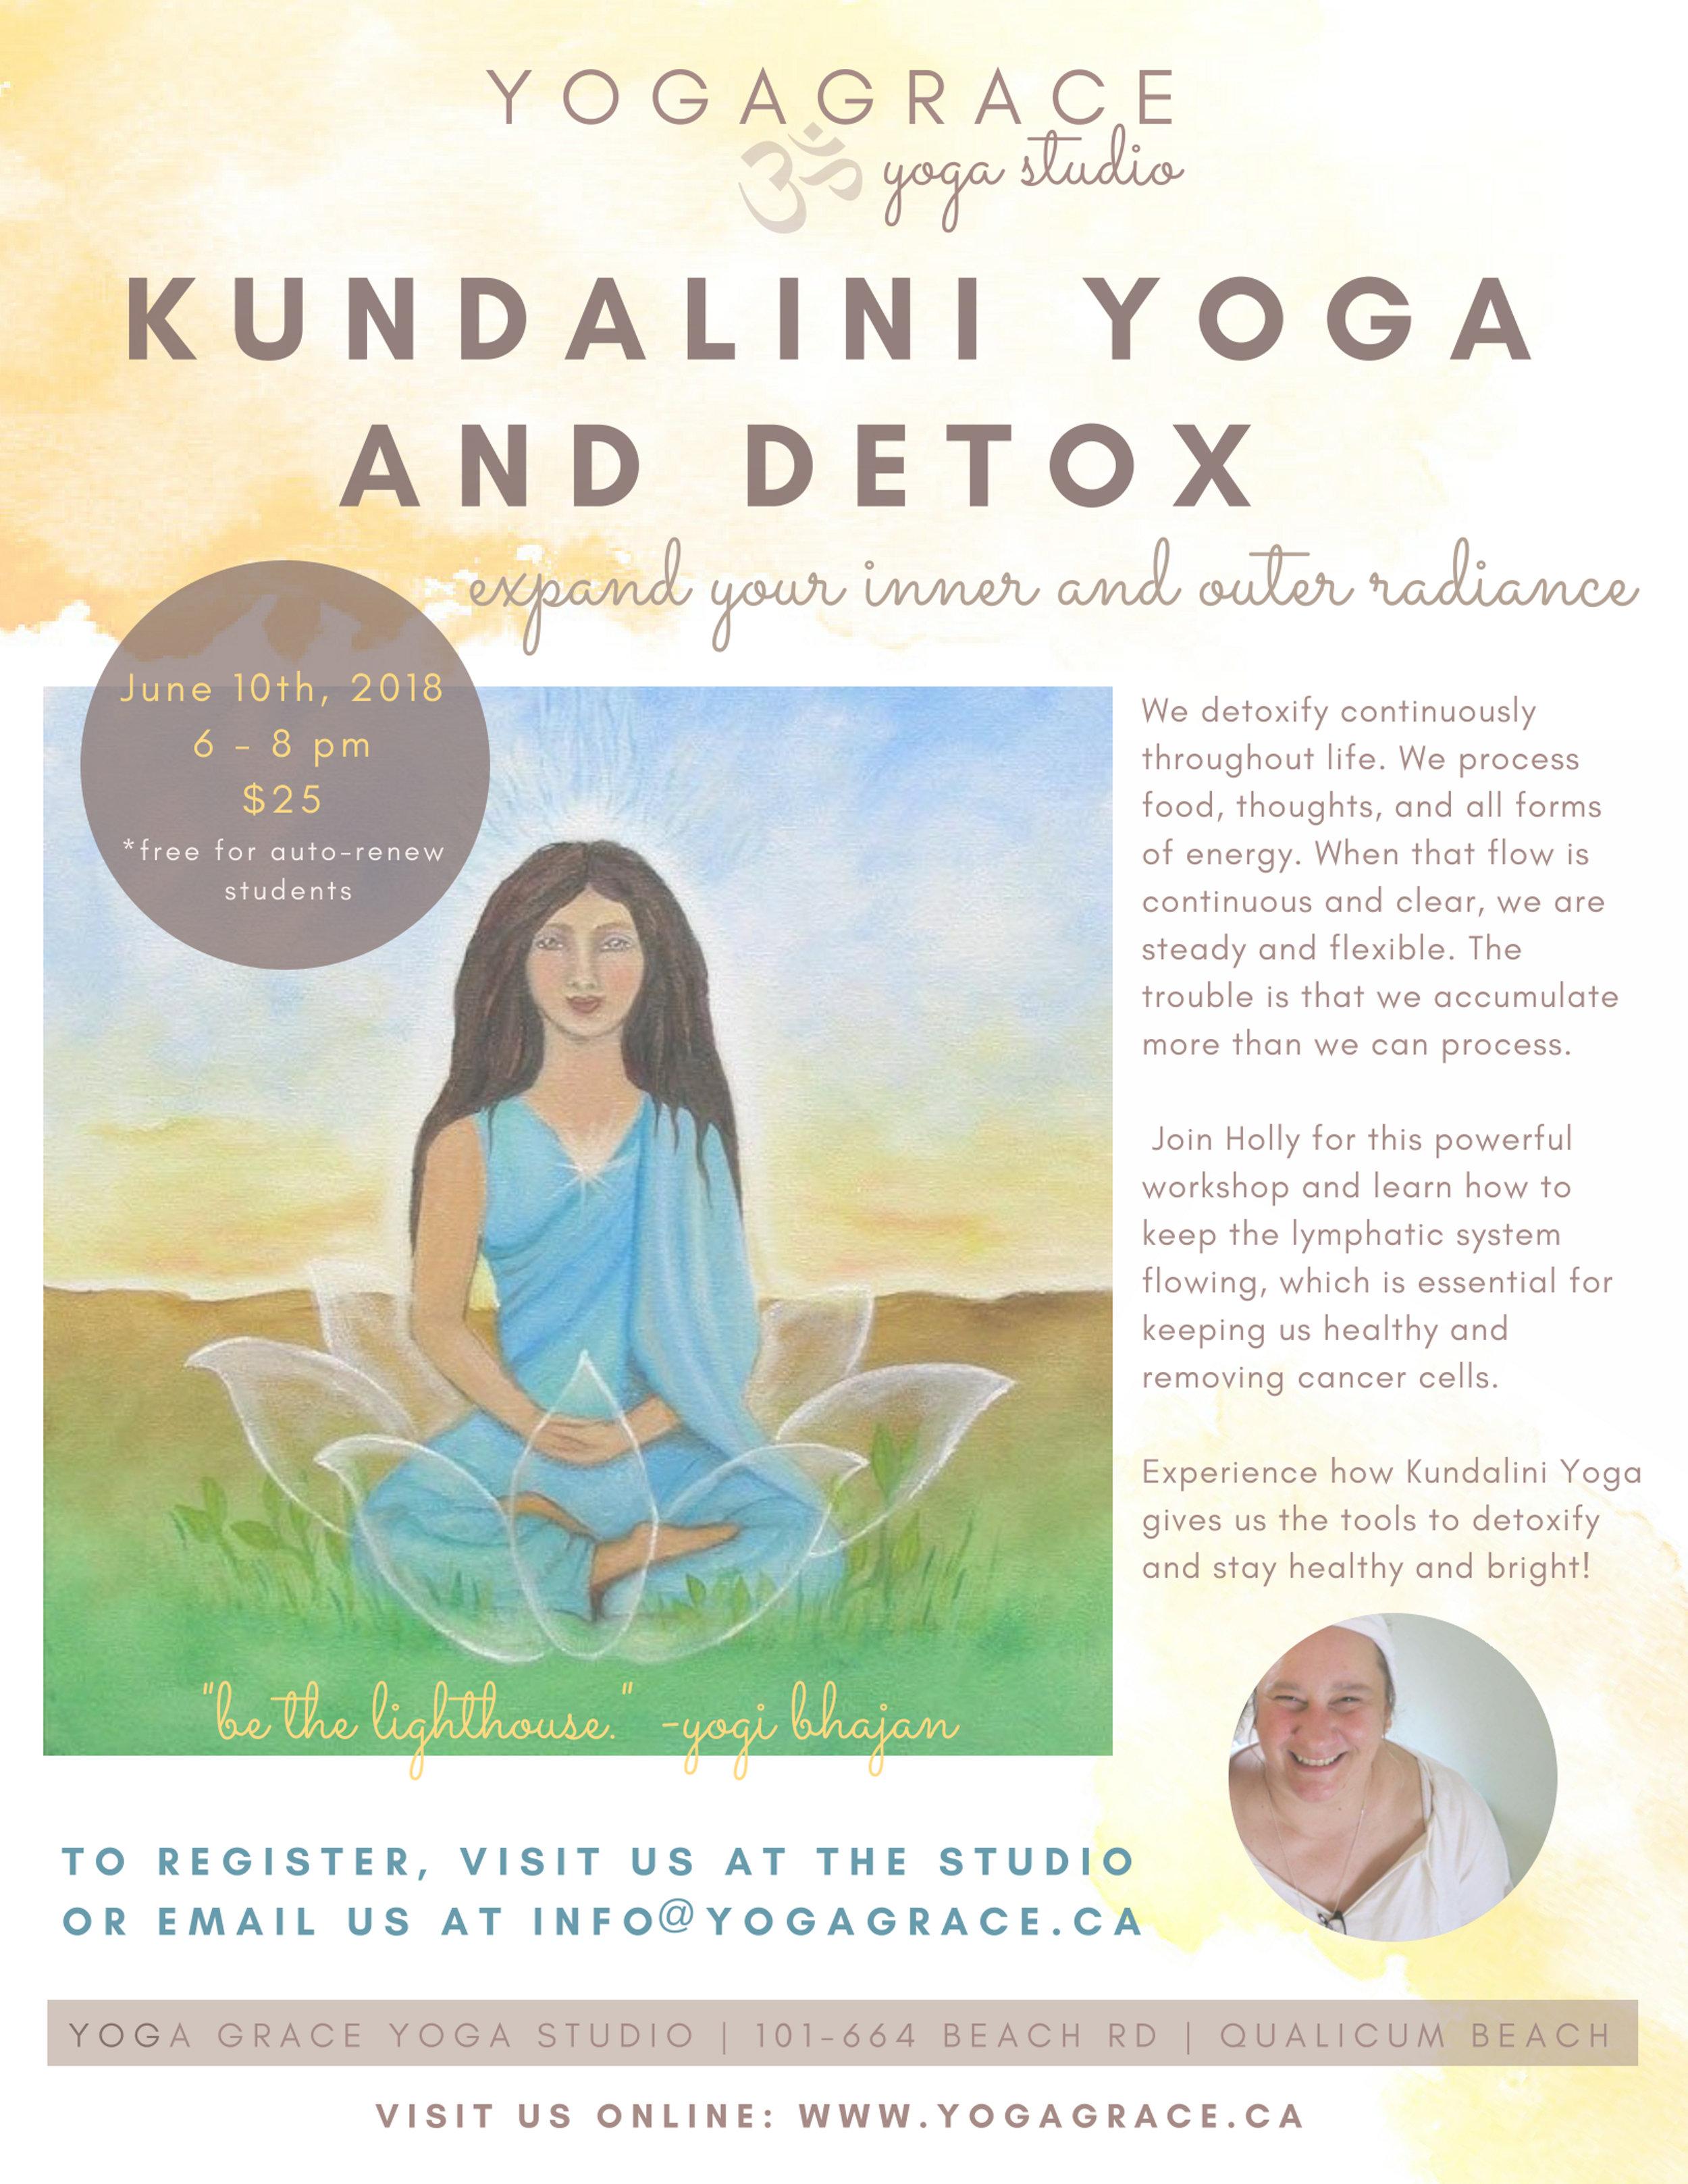 Kundalini and Detox Workshop